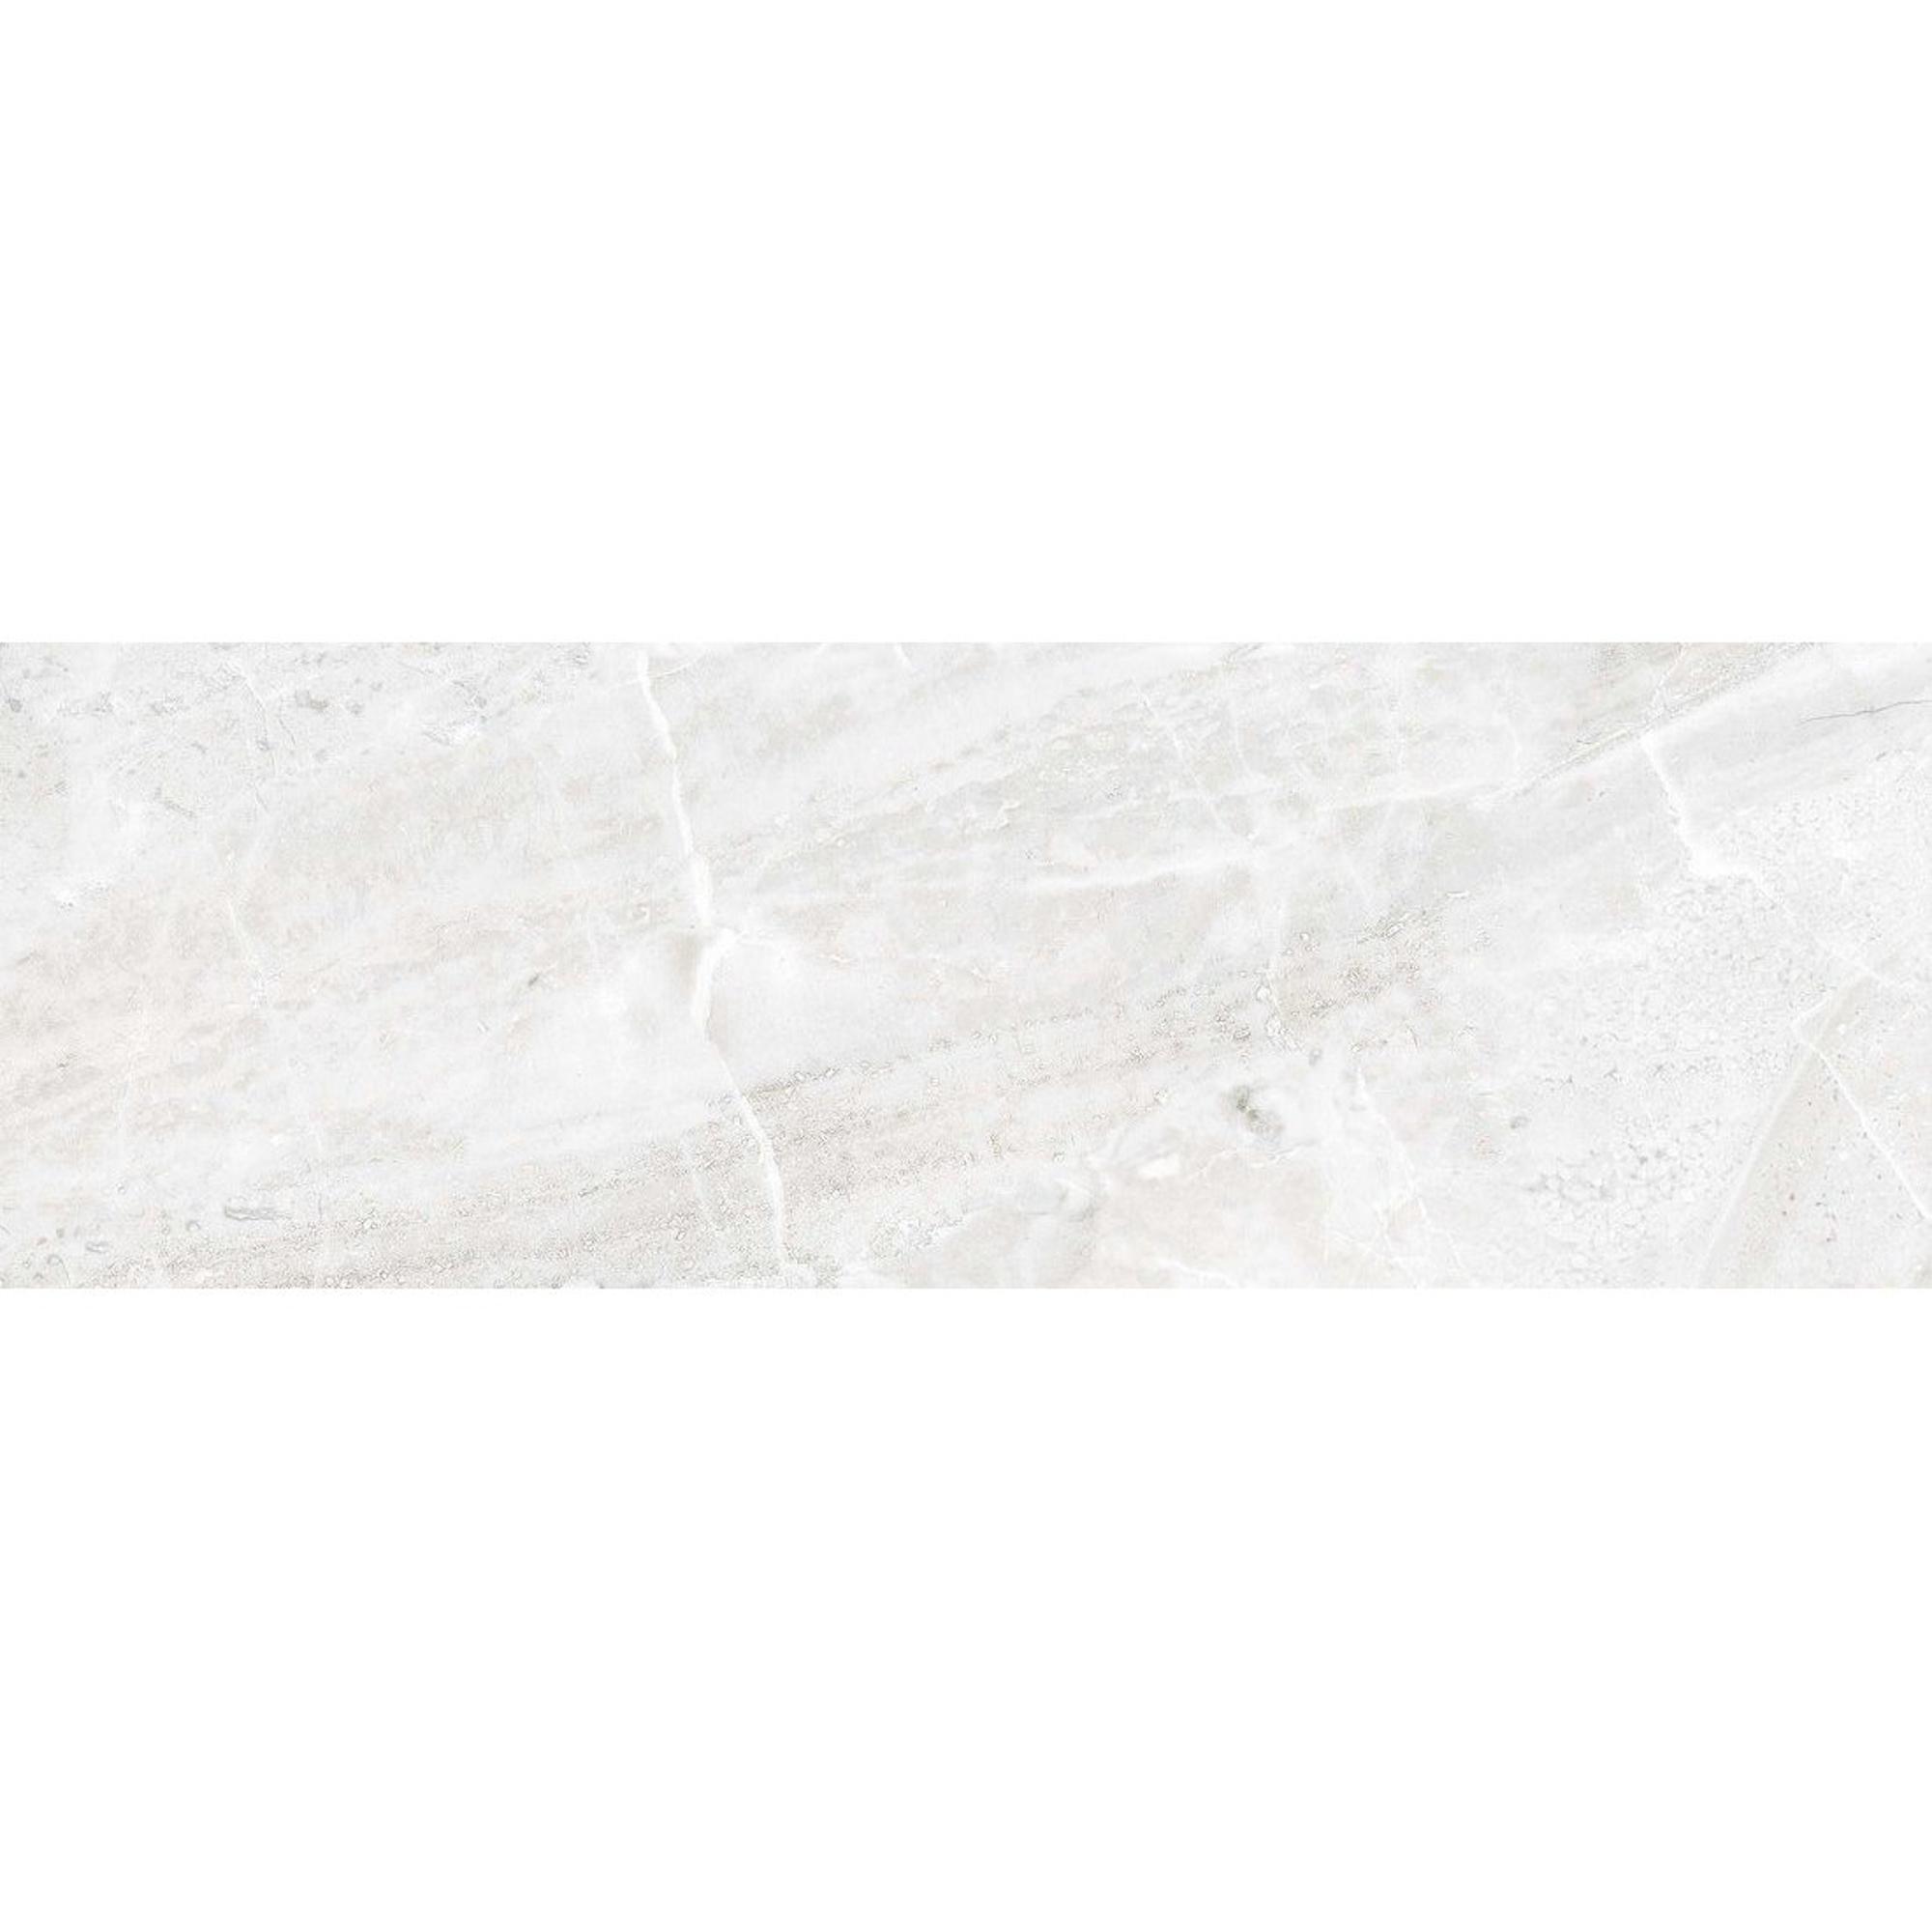 Плитка Undefasa Yukon Pearl 25x75 см